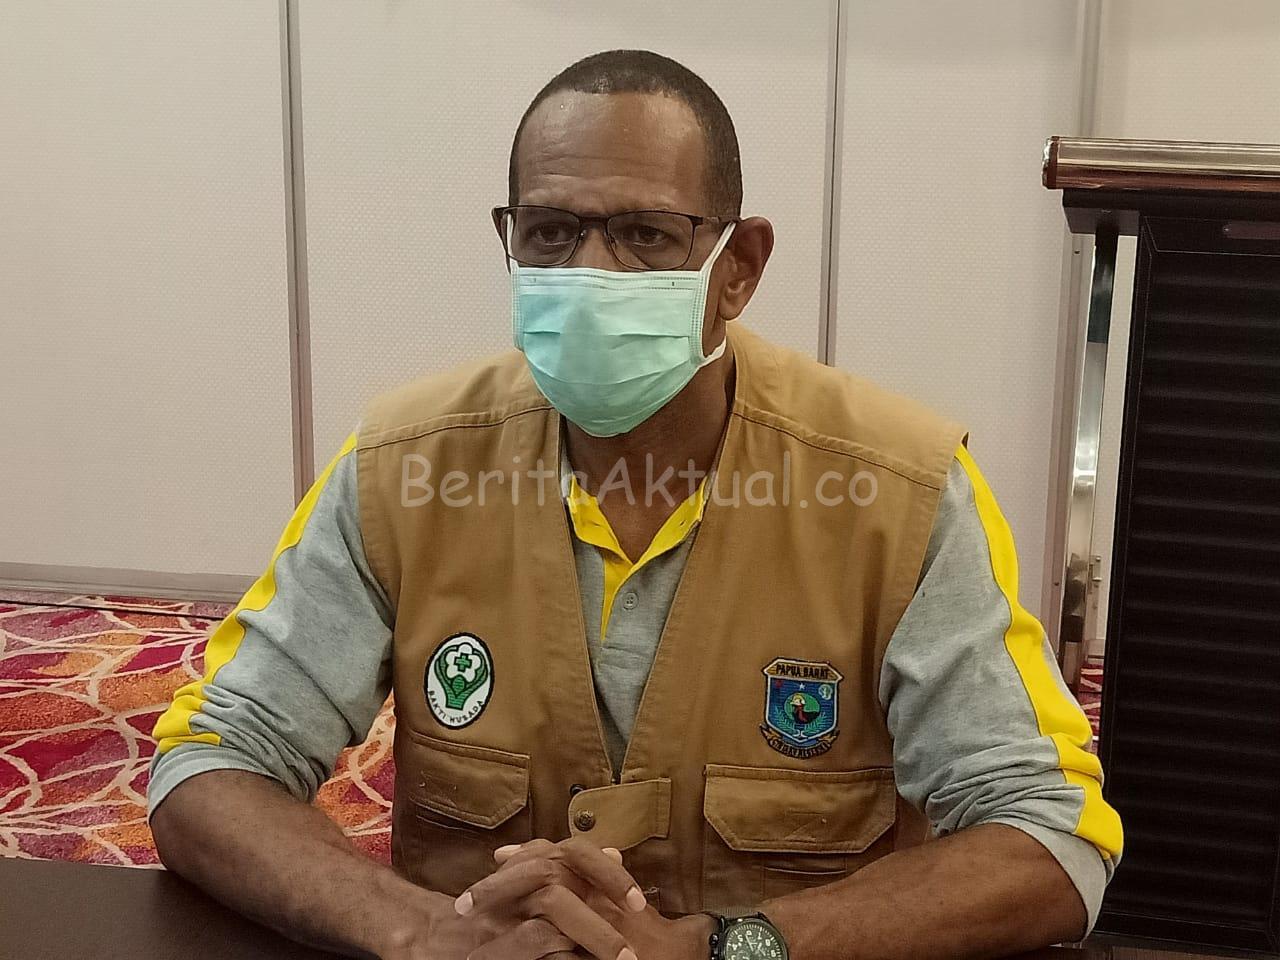 2 Warga Manokwari Terkonfirmasi Positif Covid-19 5 IMG 20200416 WA0057